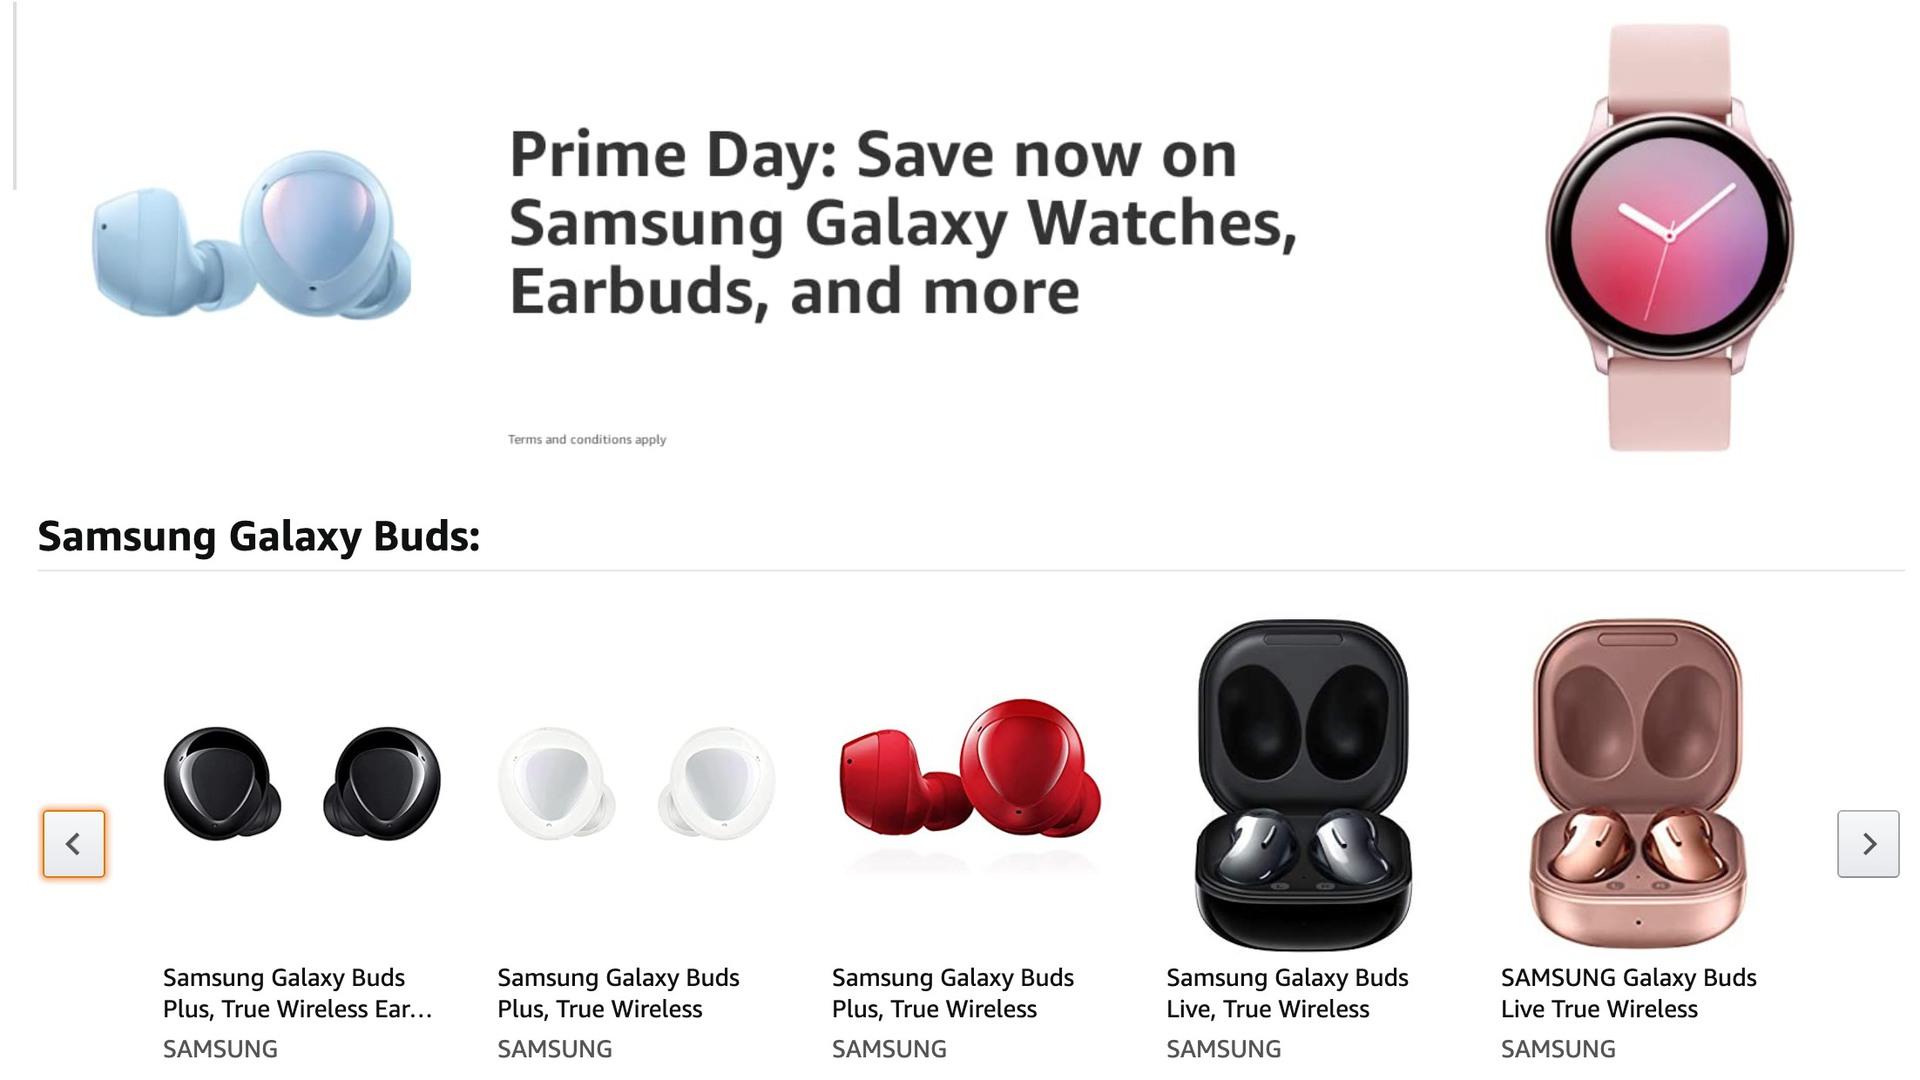 Samsung Galaxy Buds Galaxy Watches Amazon Prime Day 2021 deals